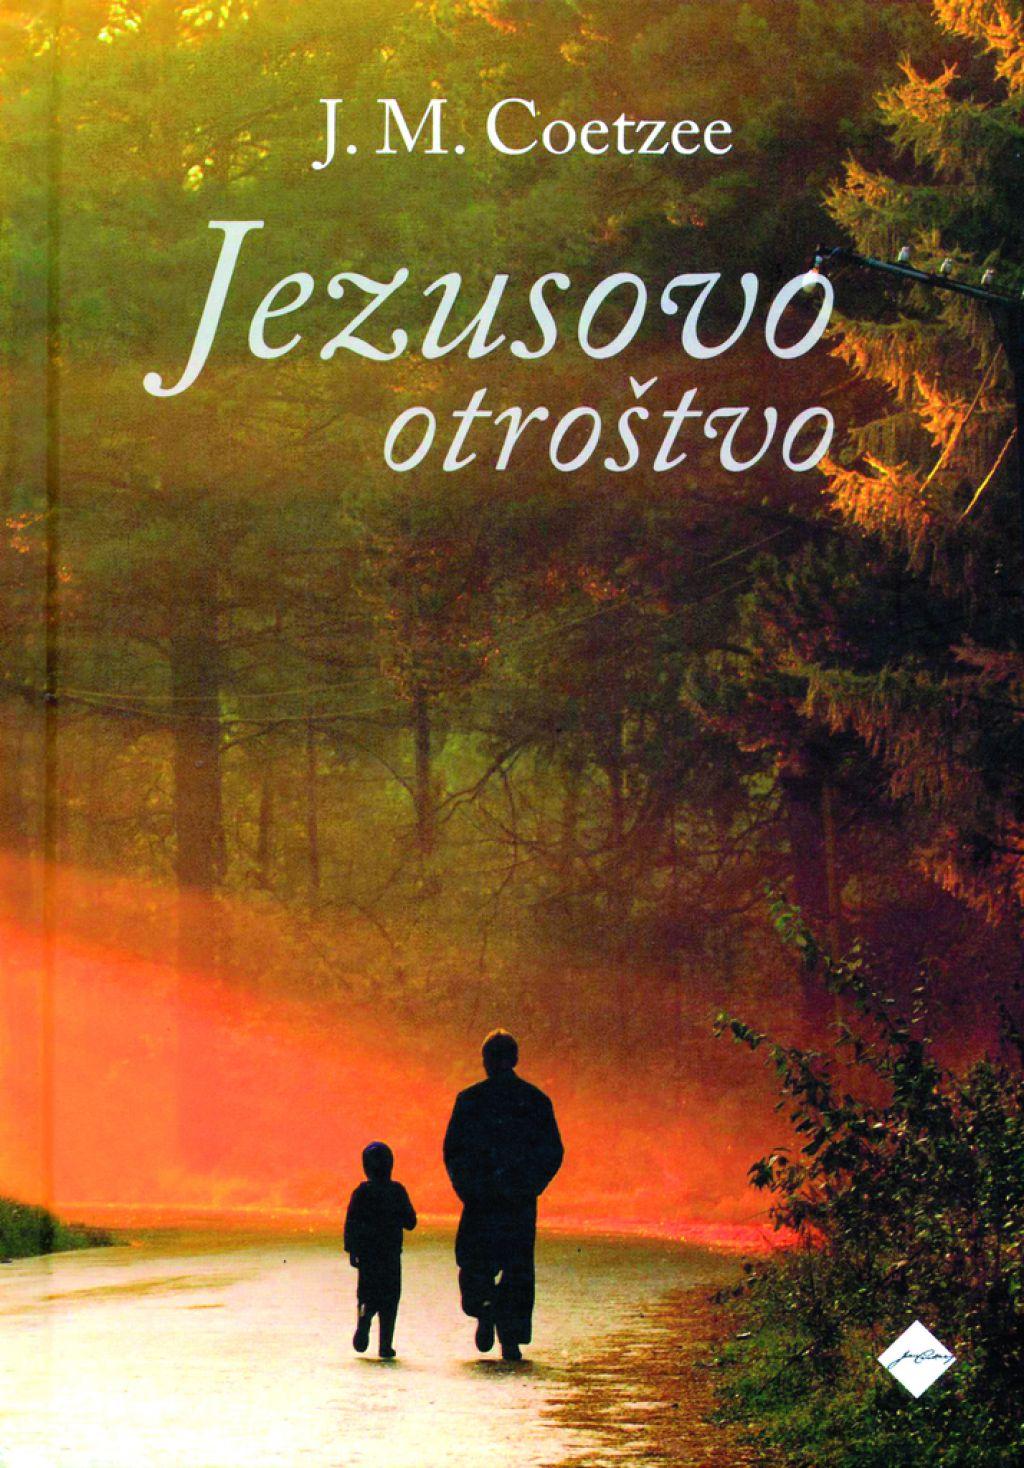 Knjiga tedna: Jezusovo otroštvo